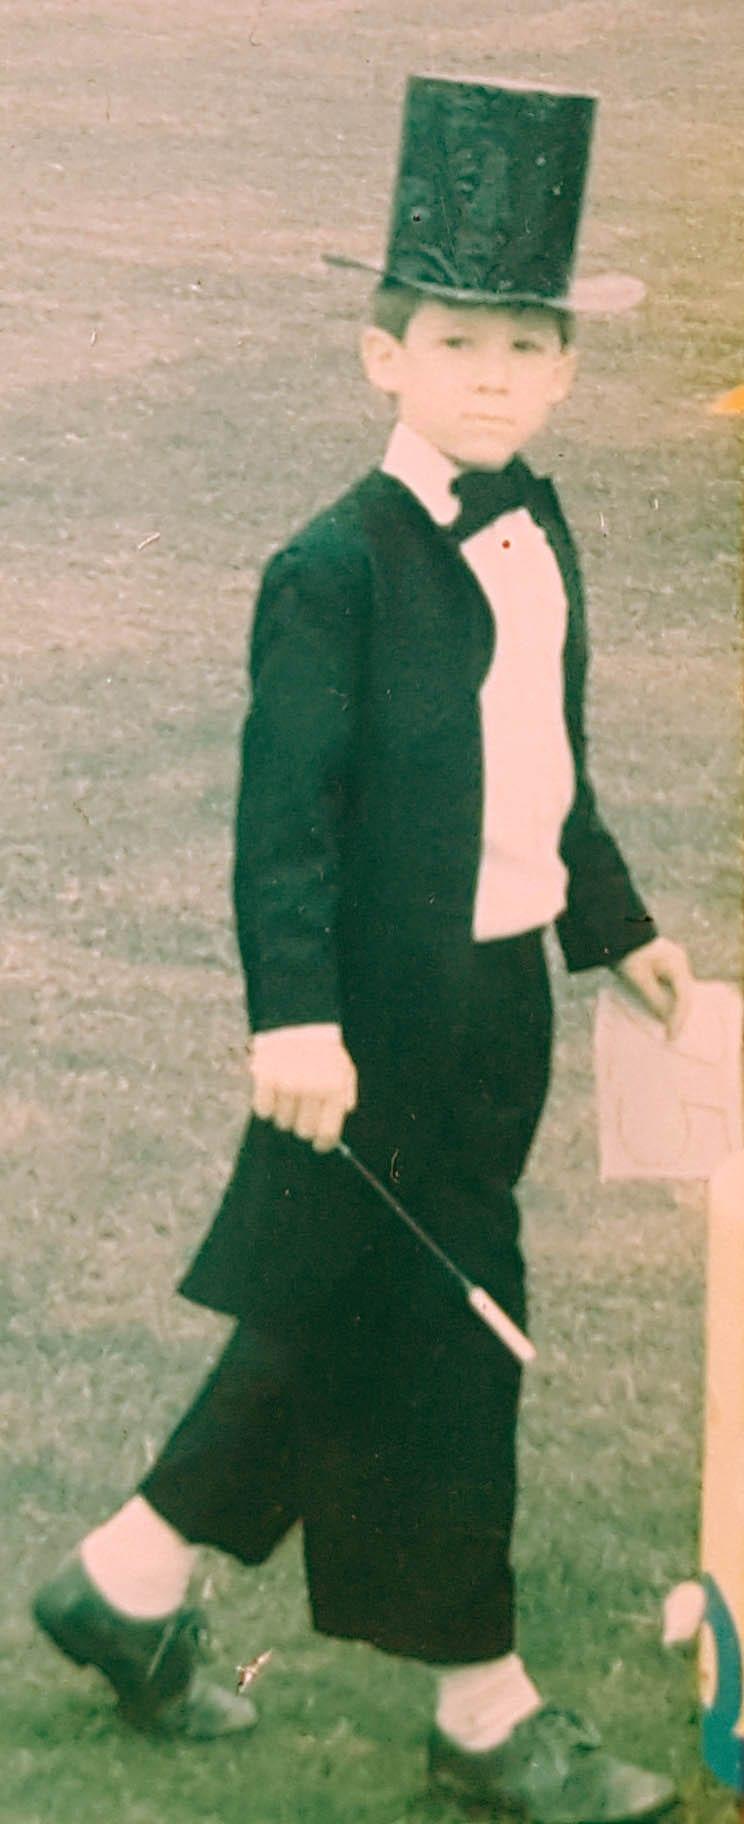 Thomas Duggan in costume